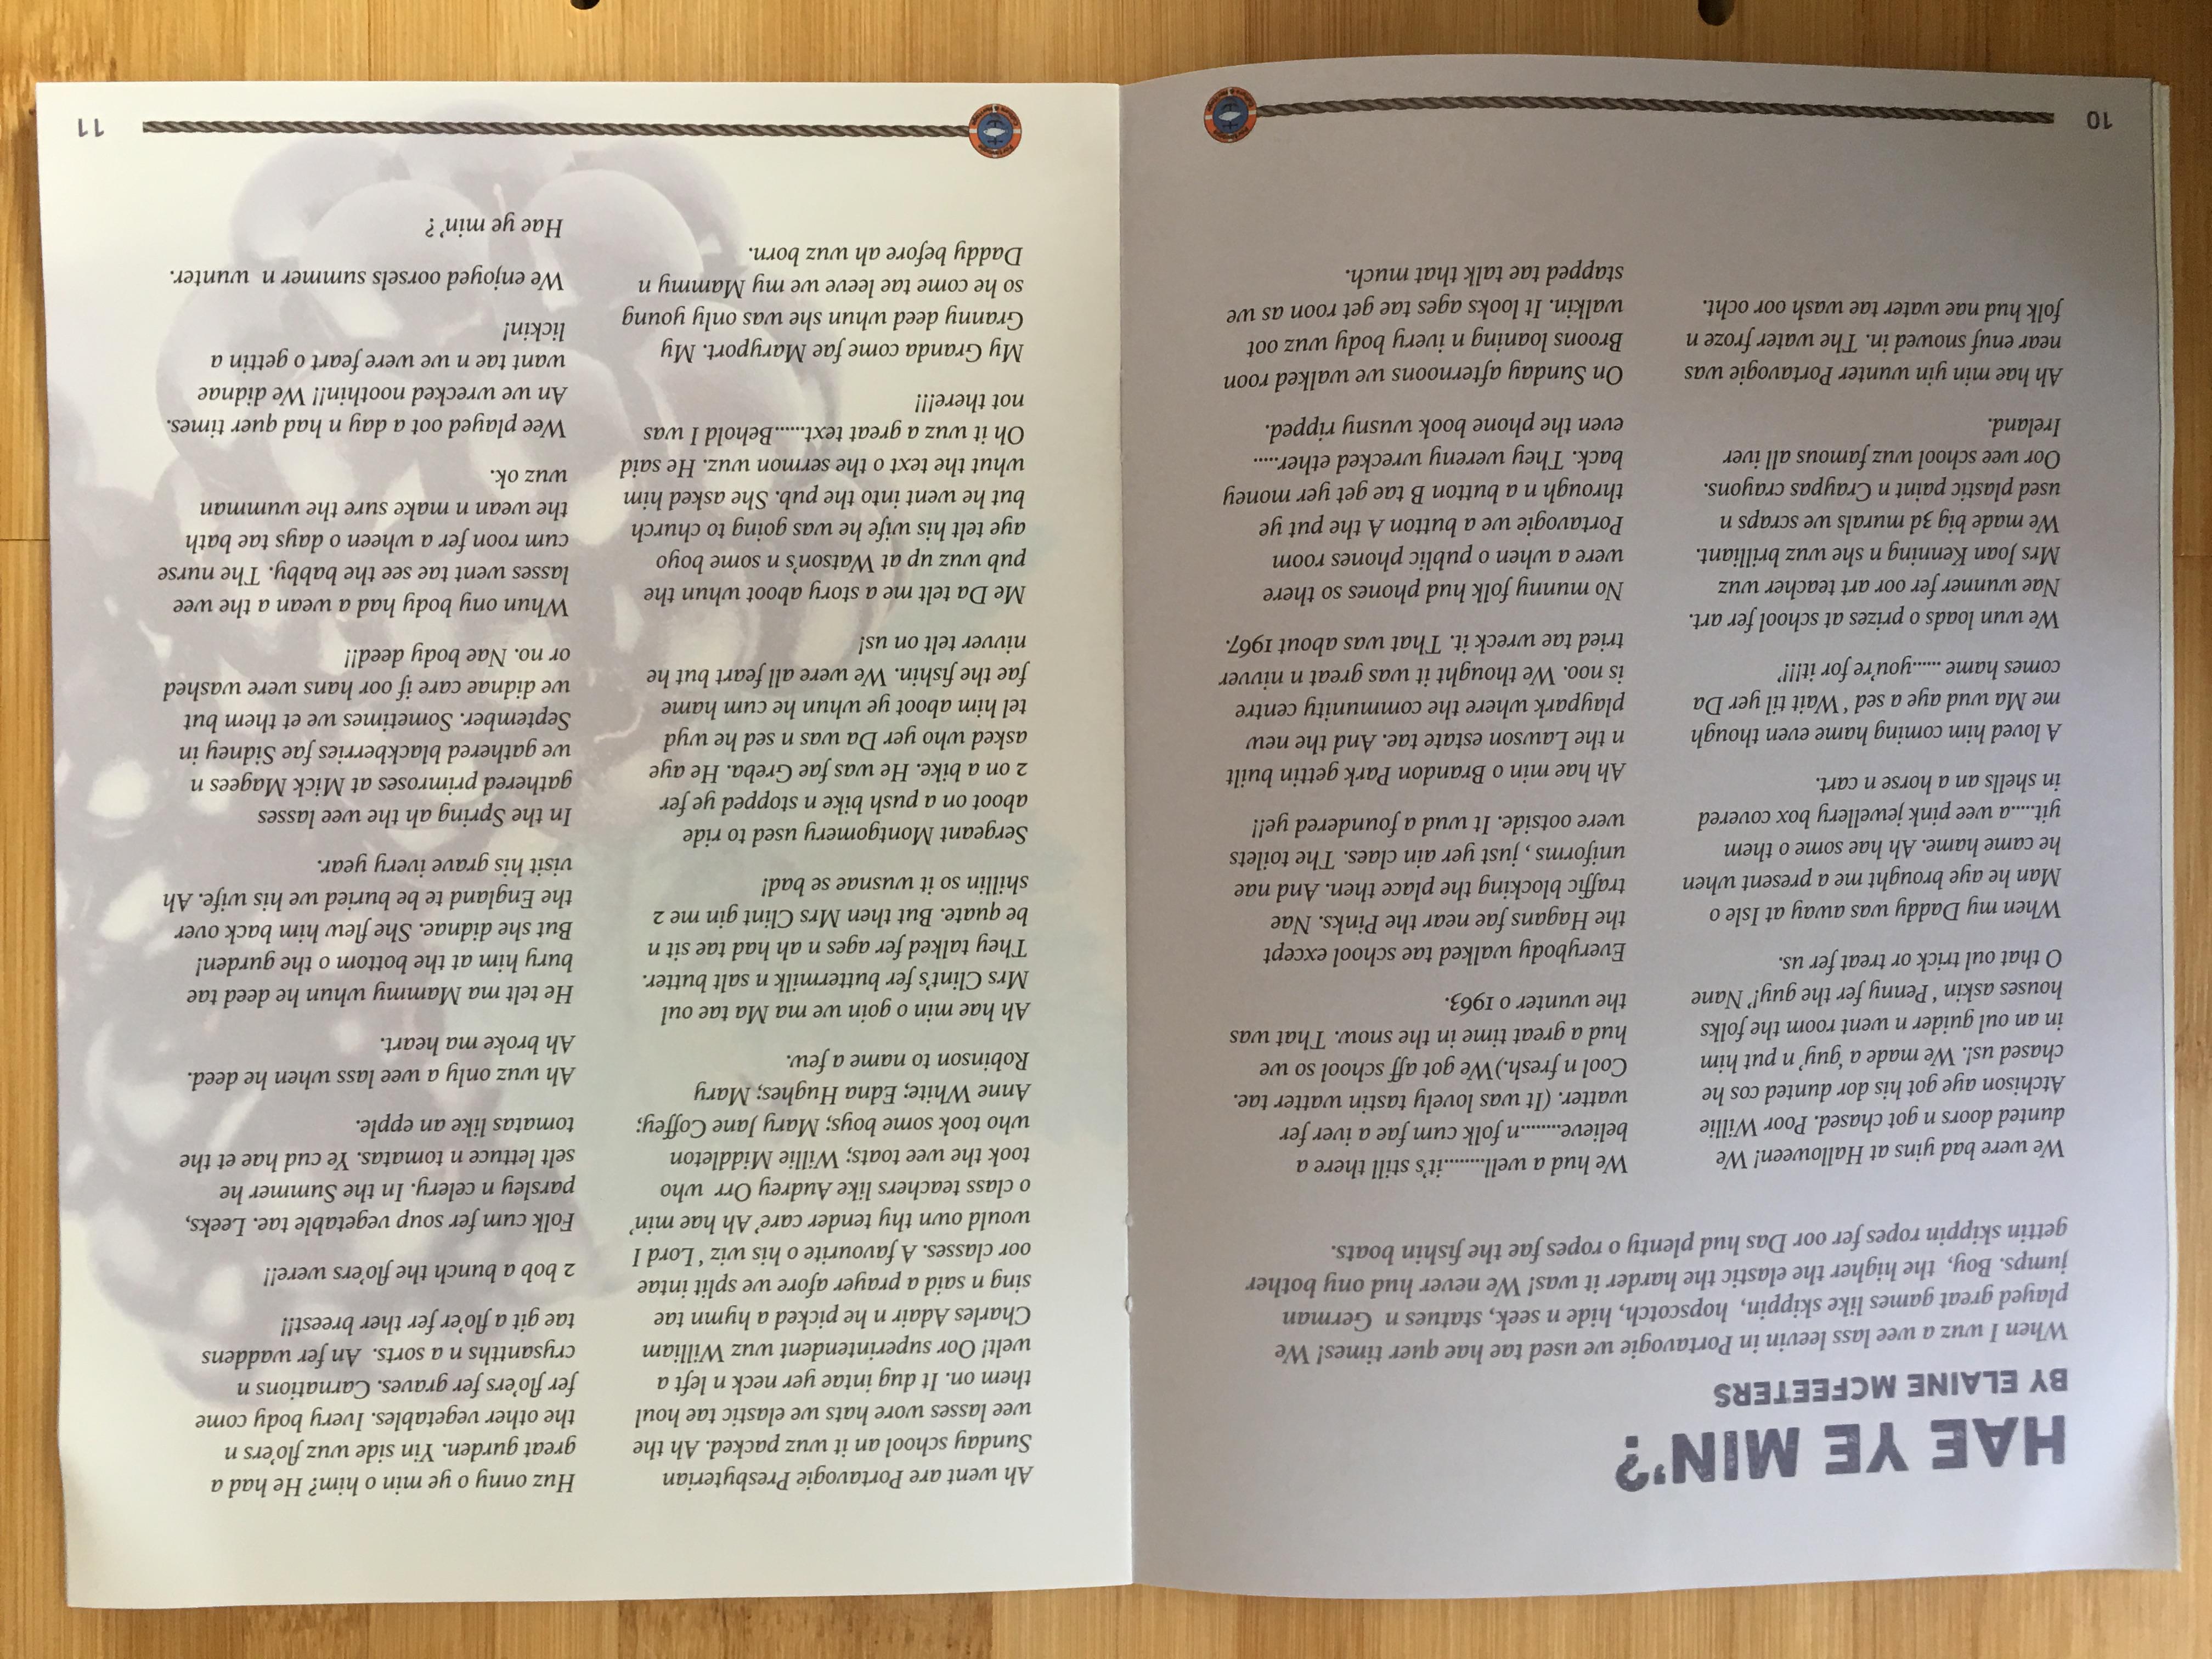 pg 10-11